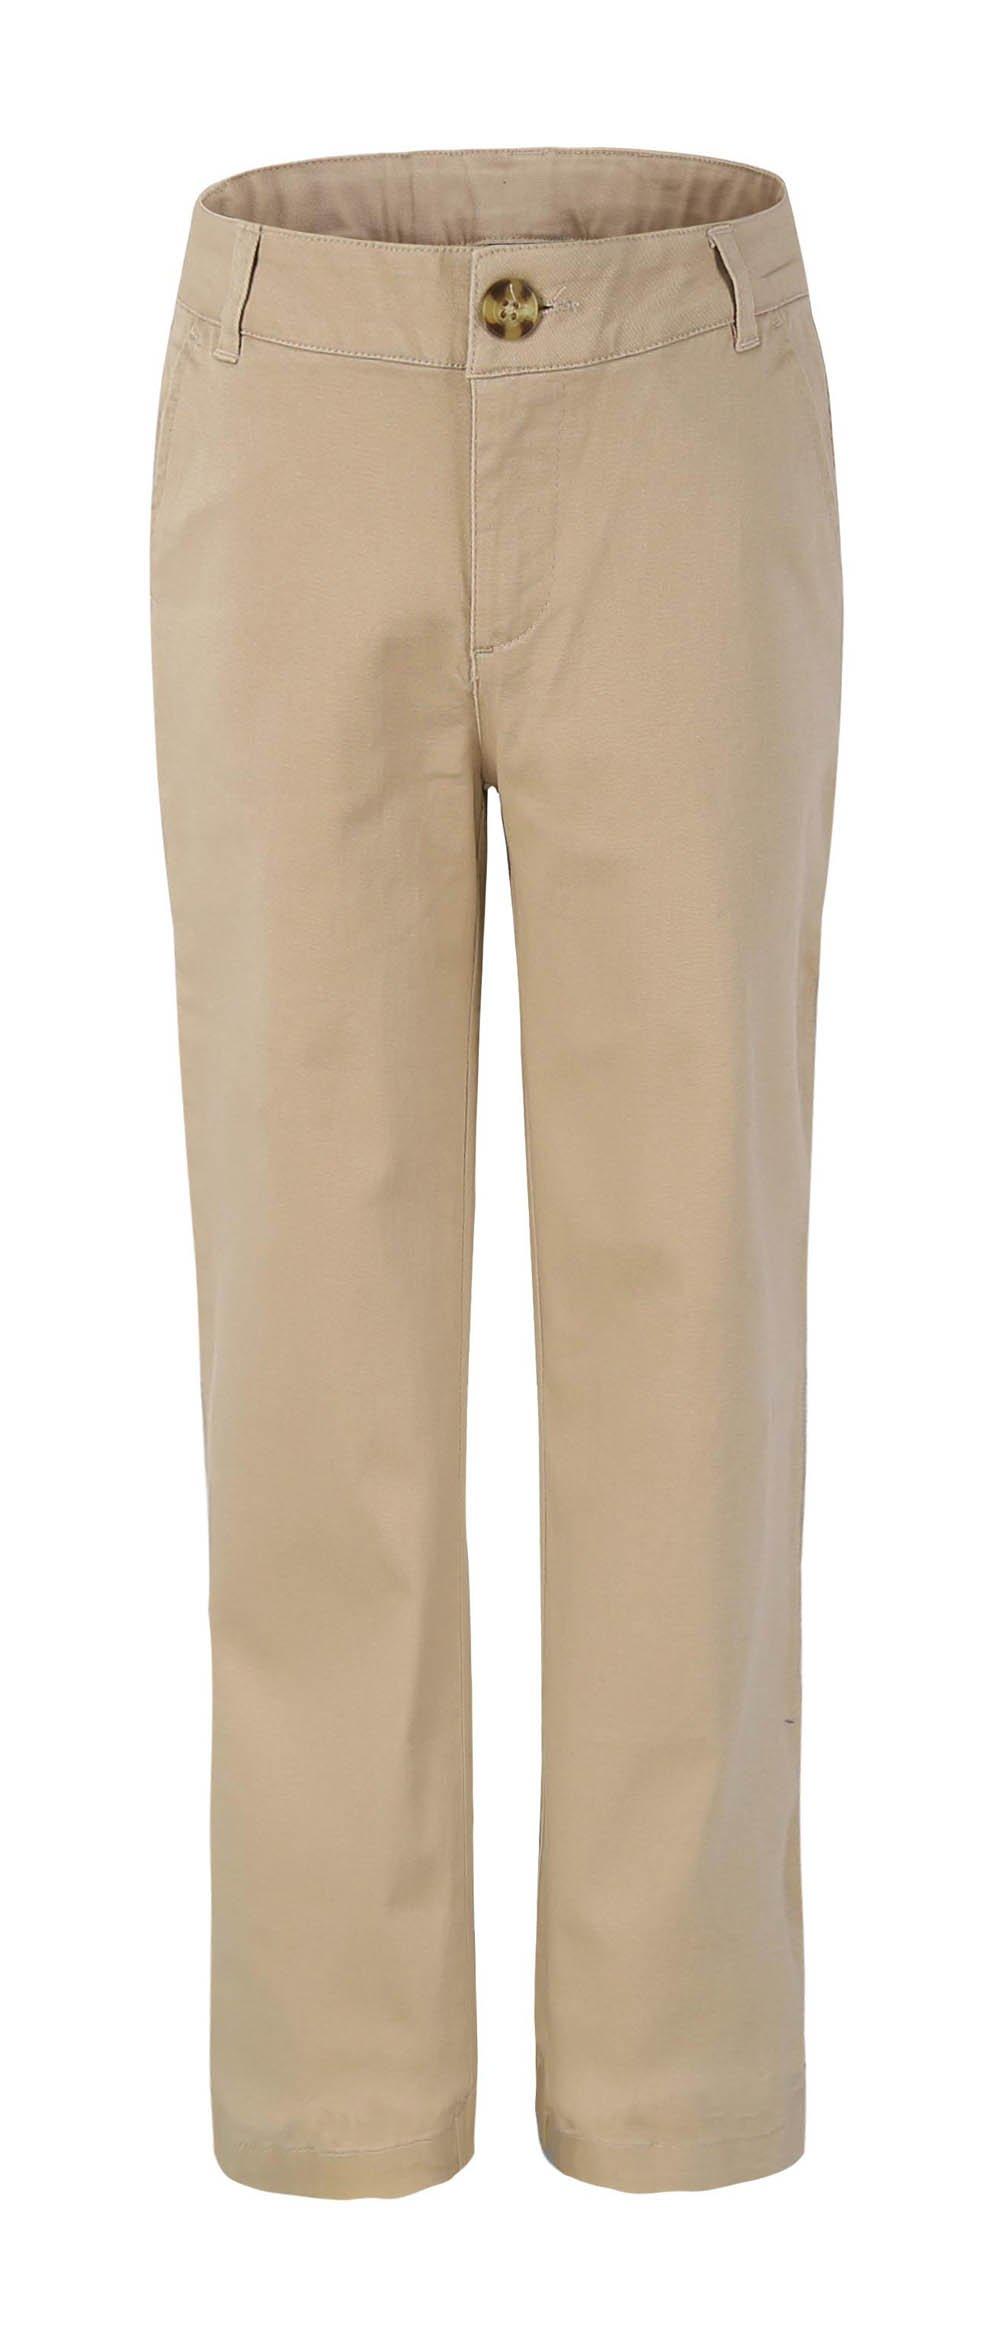 Bienzoe Girl's School Uniforms Stretchy Twill Adjust Waist Flat Front Pants Khaki Size 16